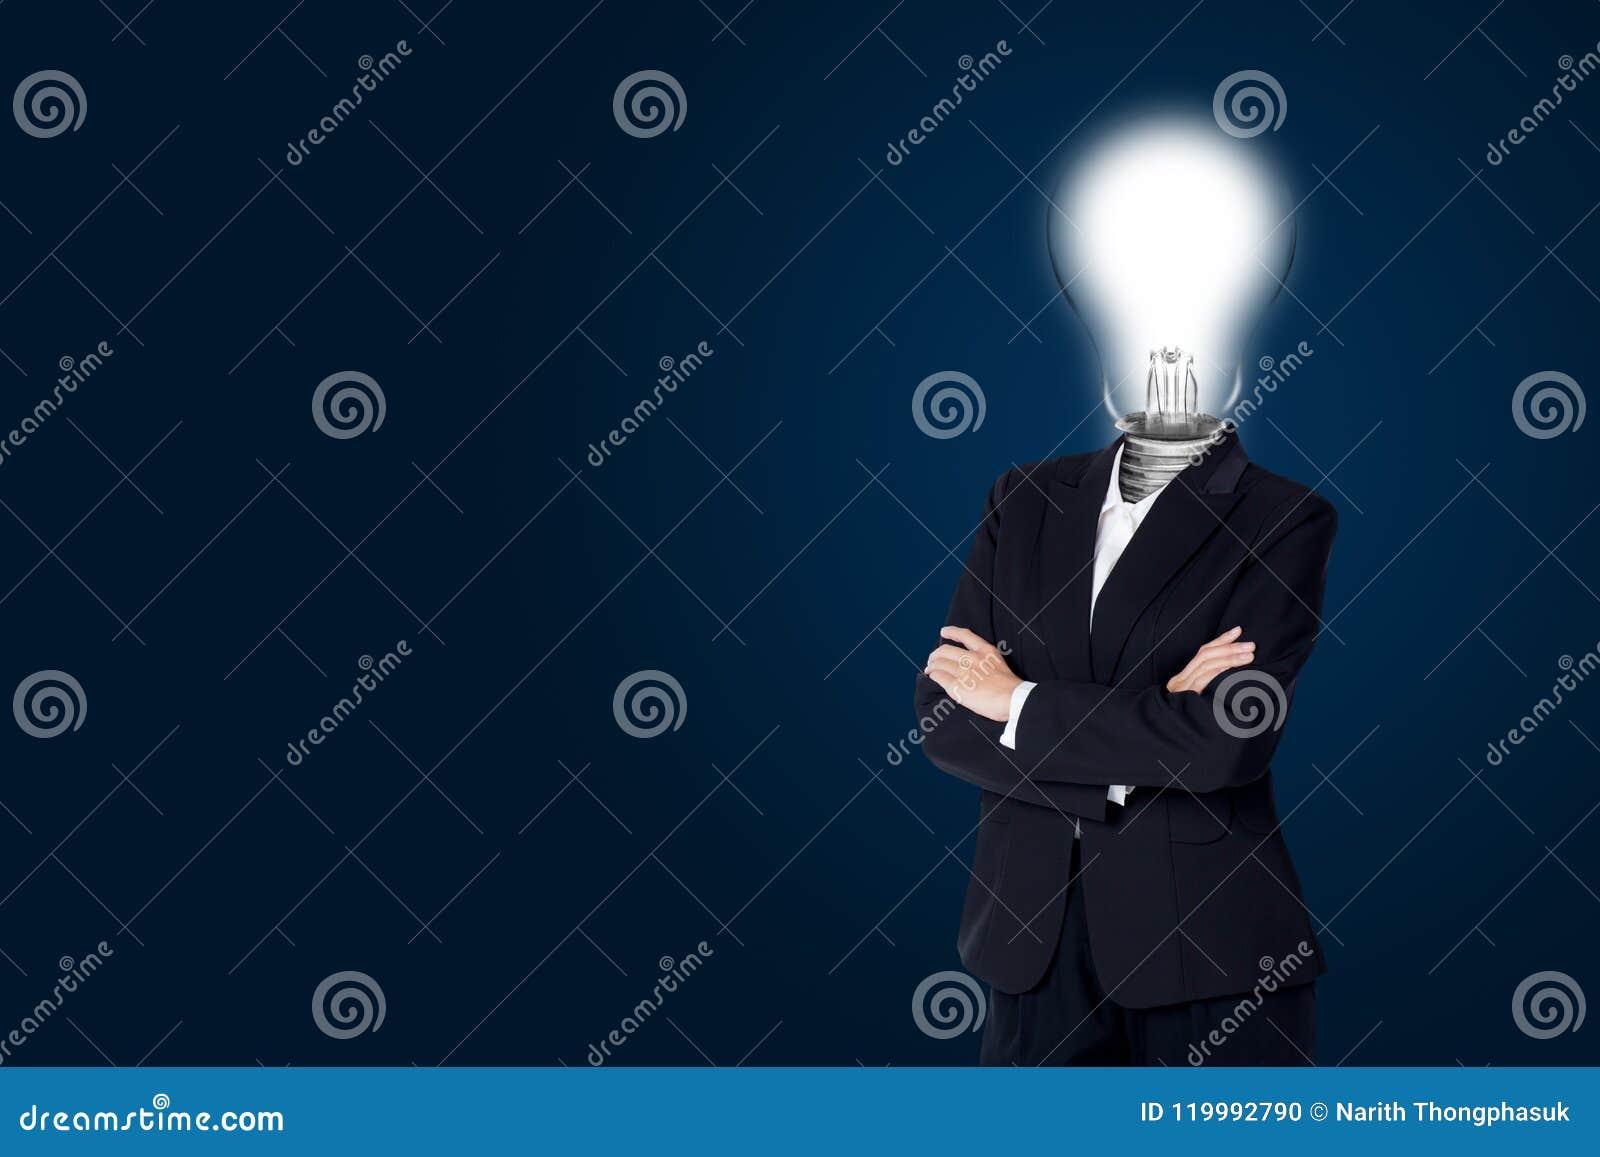 Light bulb of head business woman and have idea creativity